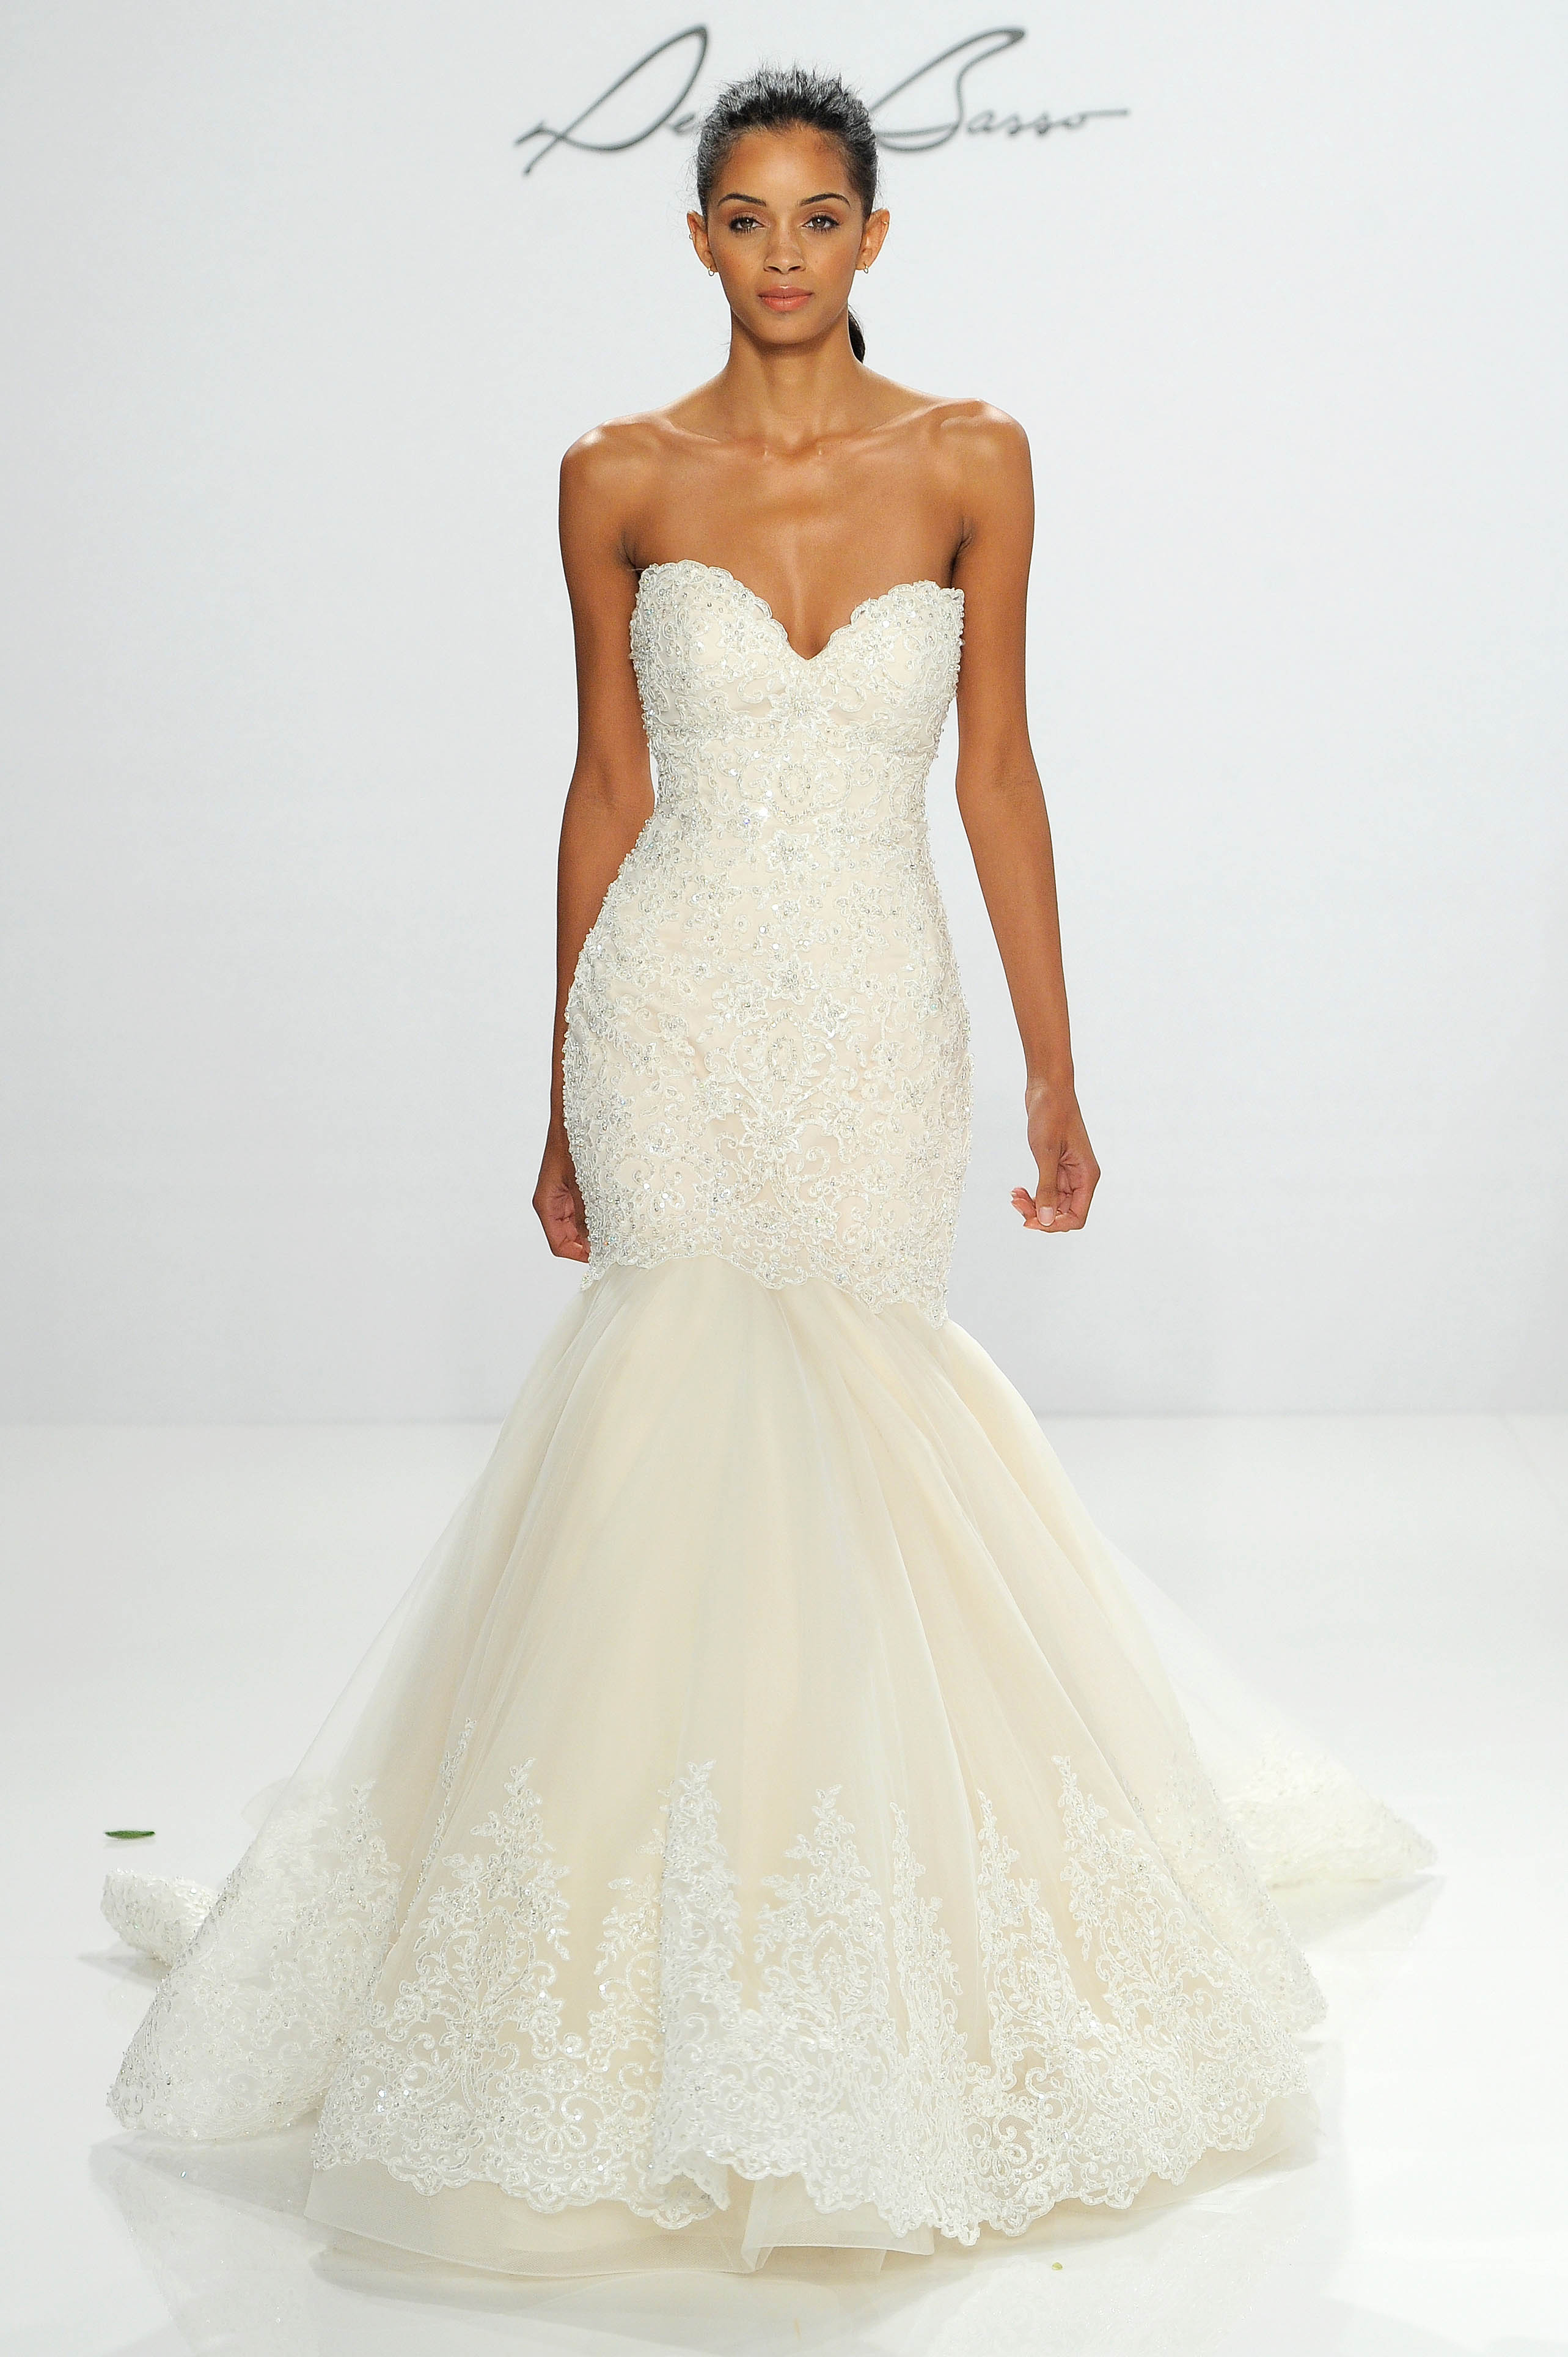 Dennis Basso Fall 2017 Wedding Dress Collection